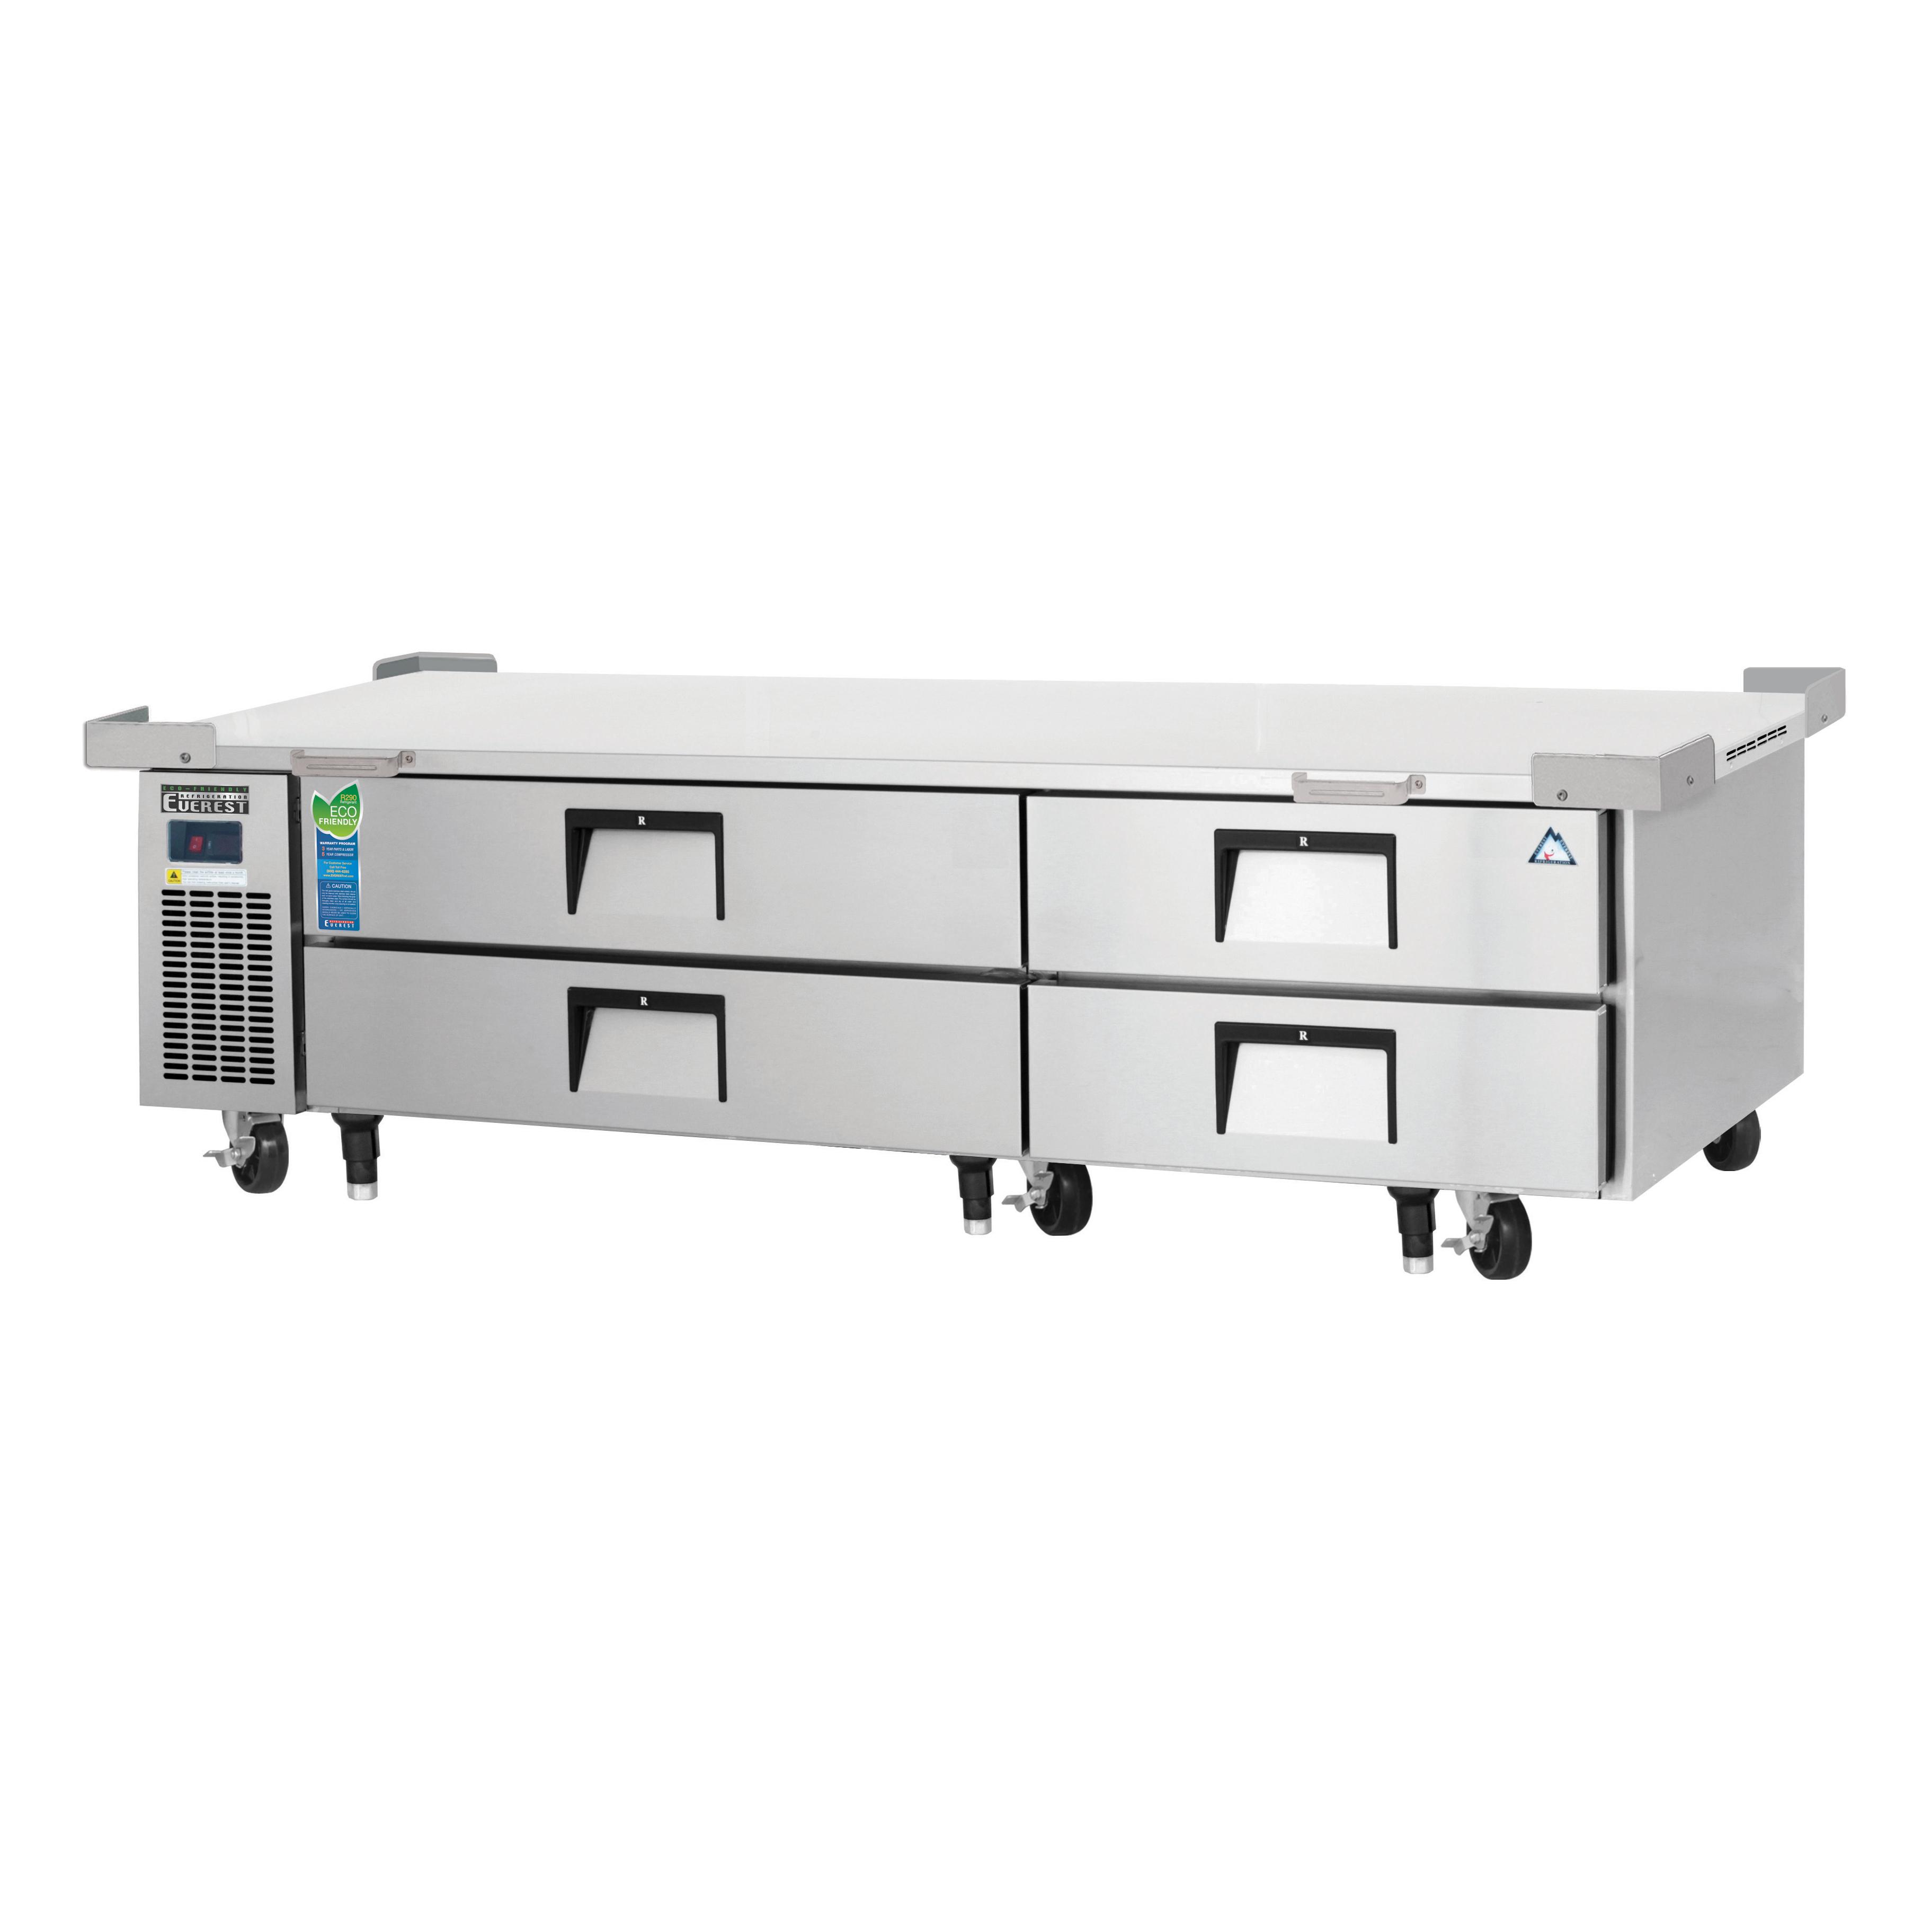 Everest Refrigeration ECB82-86D4 equipment stand, refrigerated base